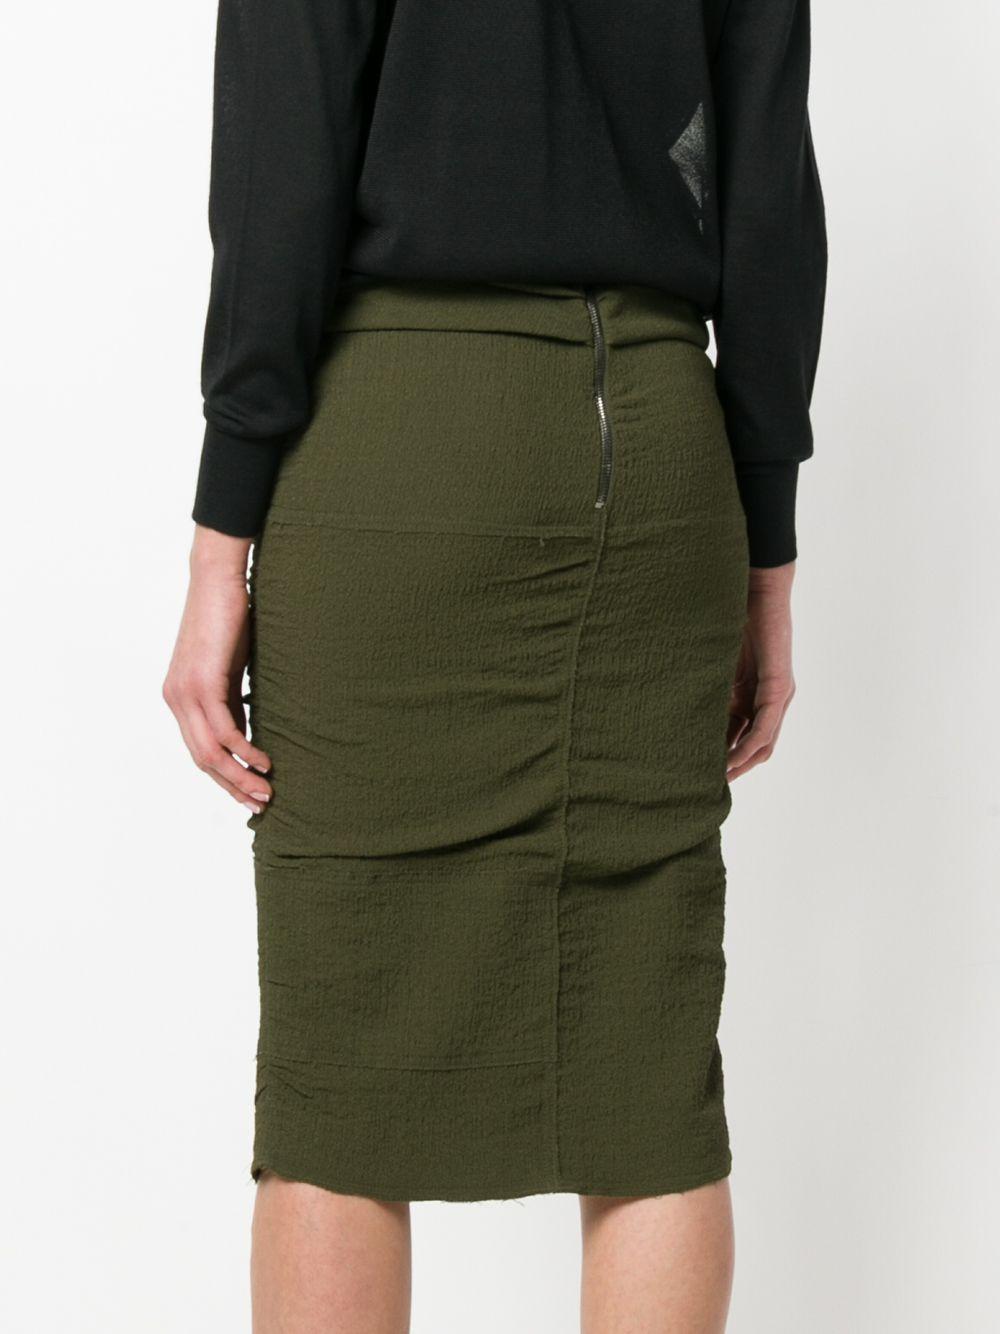 Tom Ford | юбка-карандаш с панельным дизайном | Clouty